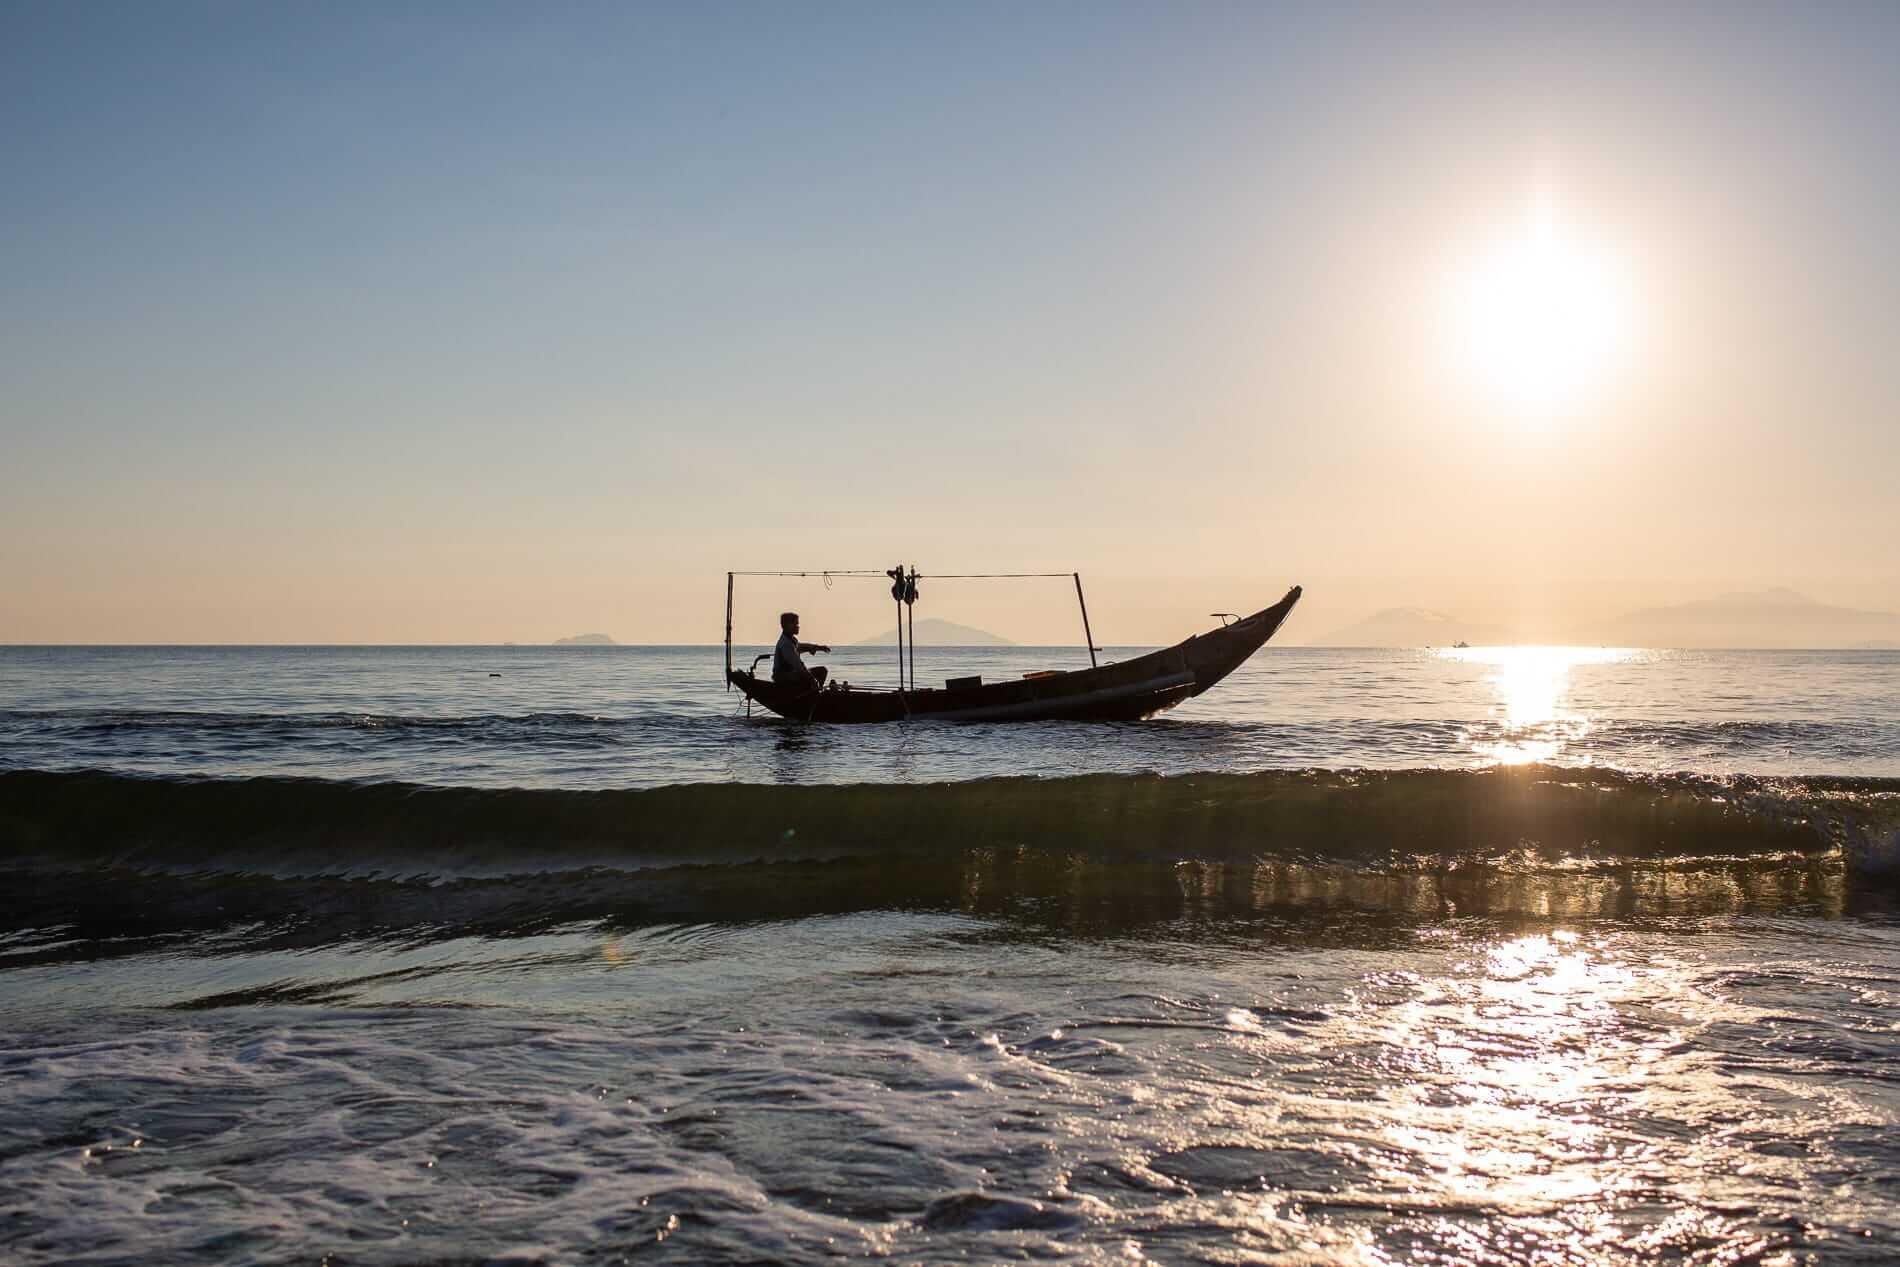 A fisherman busy fishing